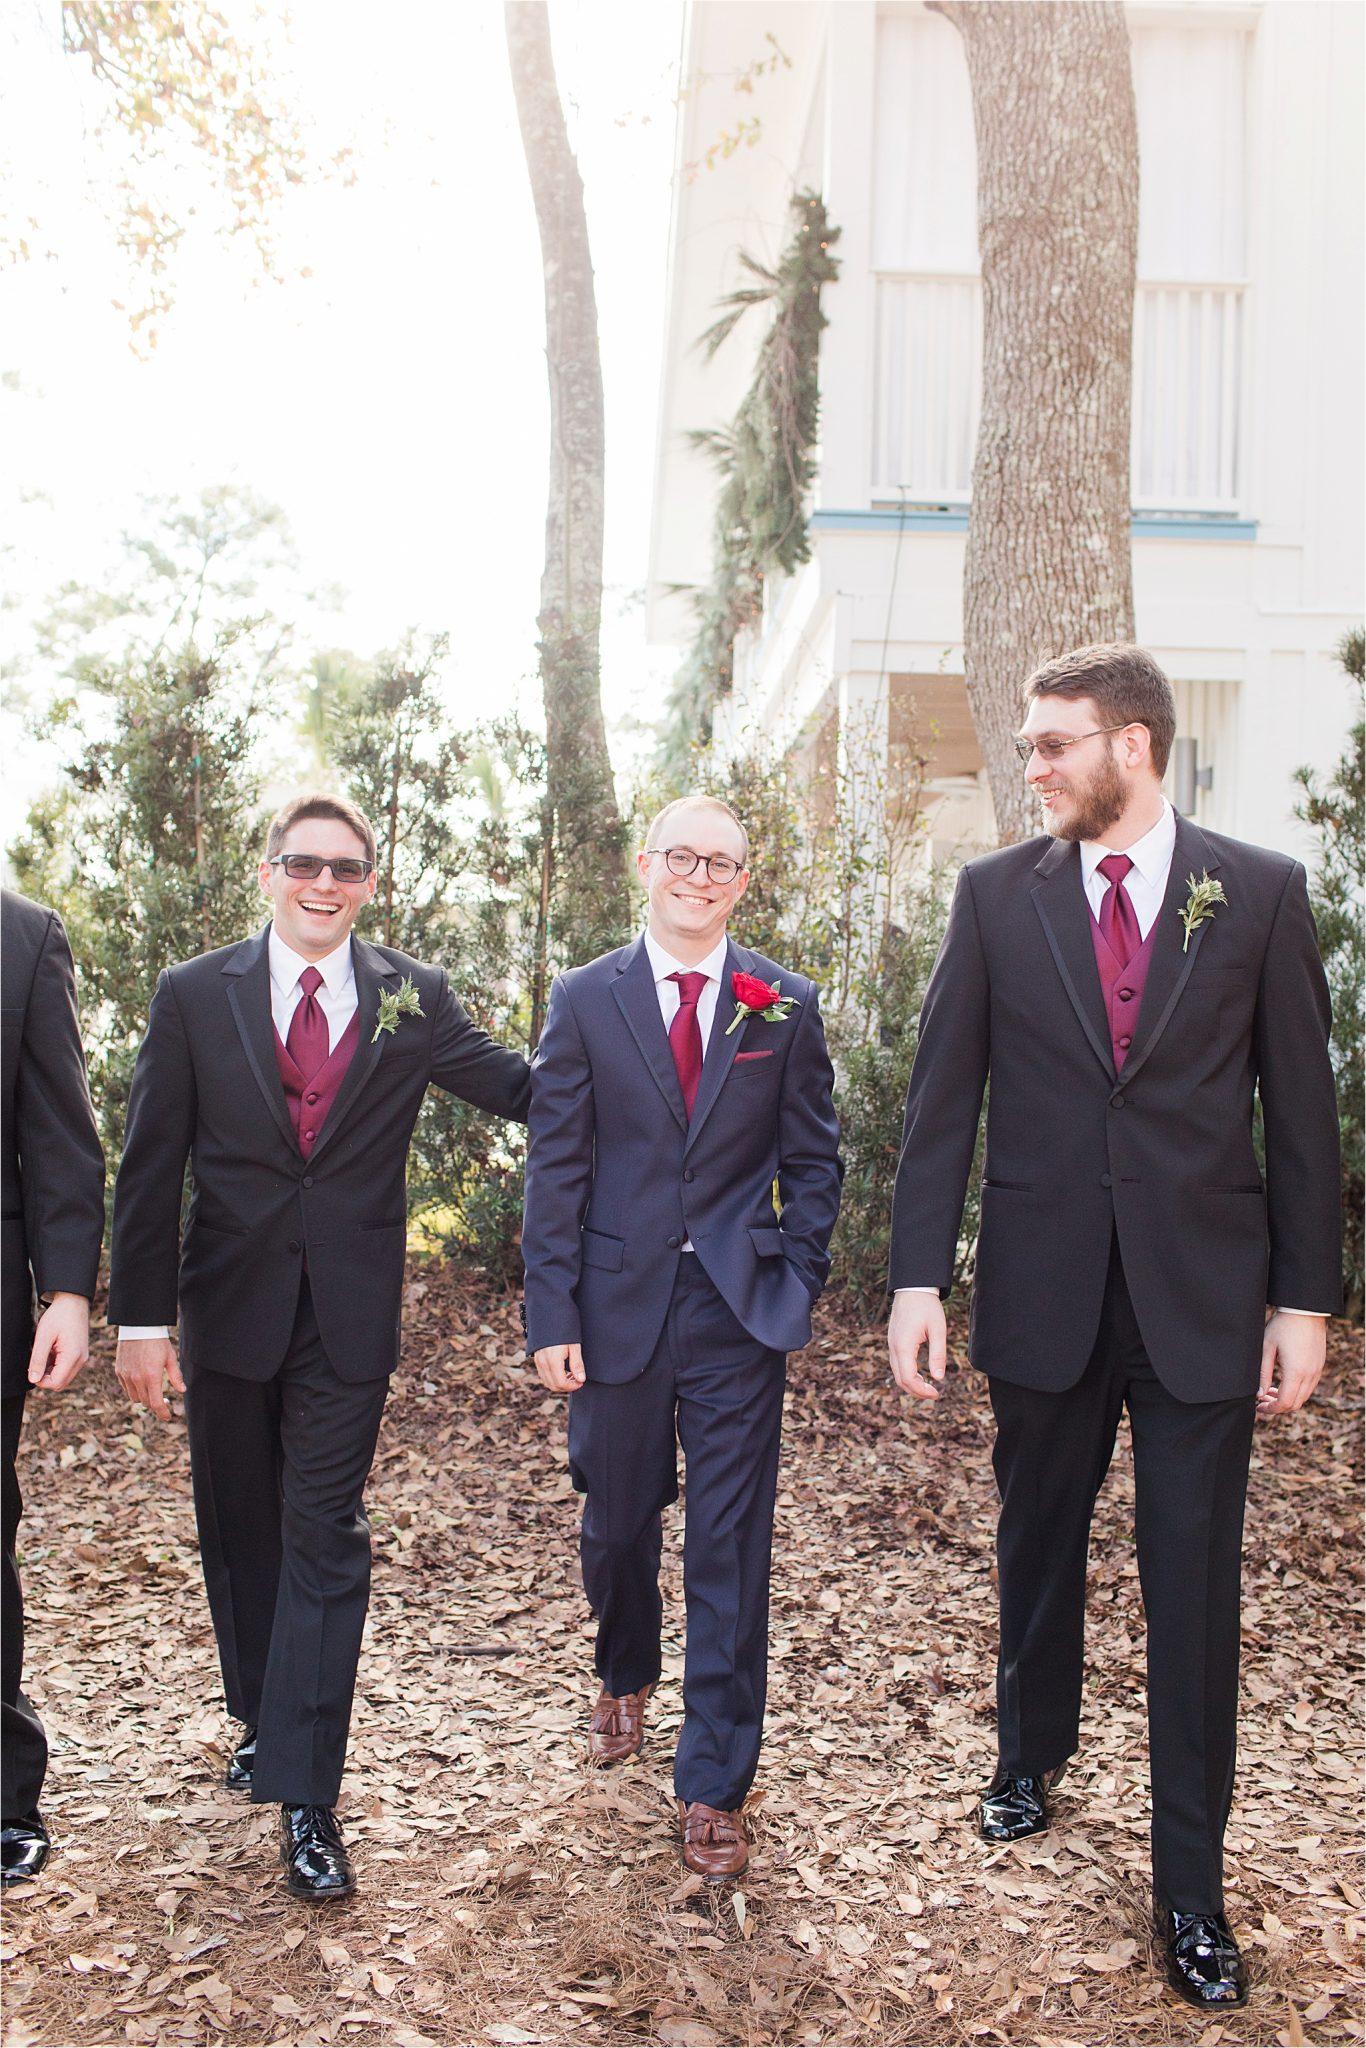 Alabama Wedding Photographer-Little Point Clear Winter Wedding-Meri Beth + Andrew-Groom and Groomsmen-Black groomsmen attire-Navy themed wedding